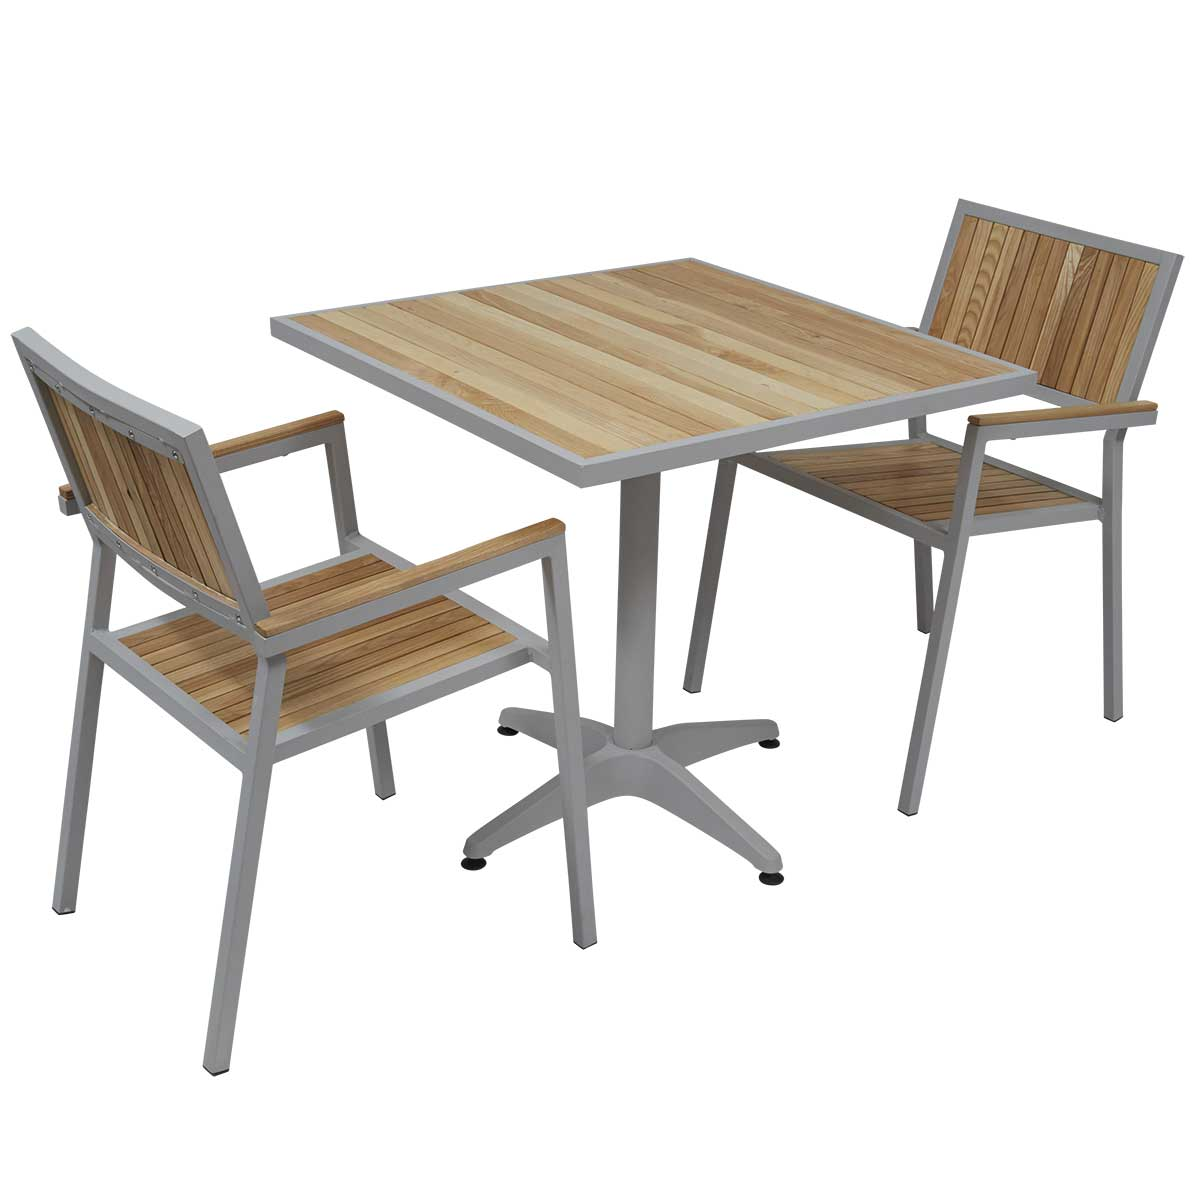 Table De Terrasse Pliante Inspirant Table Terrasse Pas Cher Of 25 Charmant Table De Terrasse Pliante